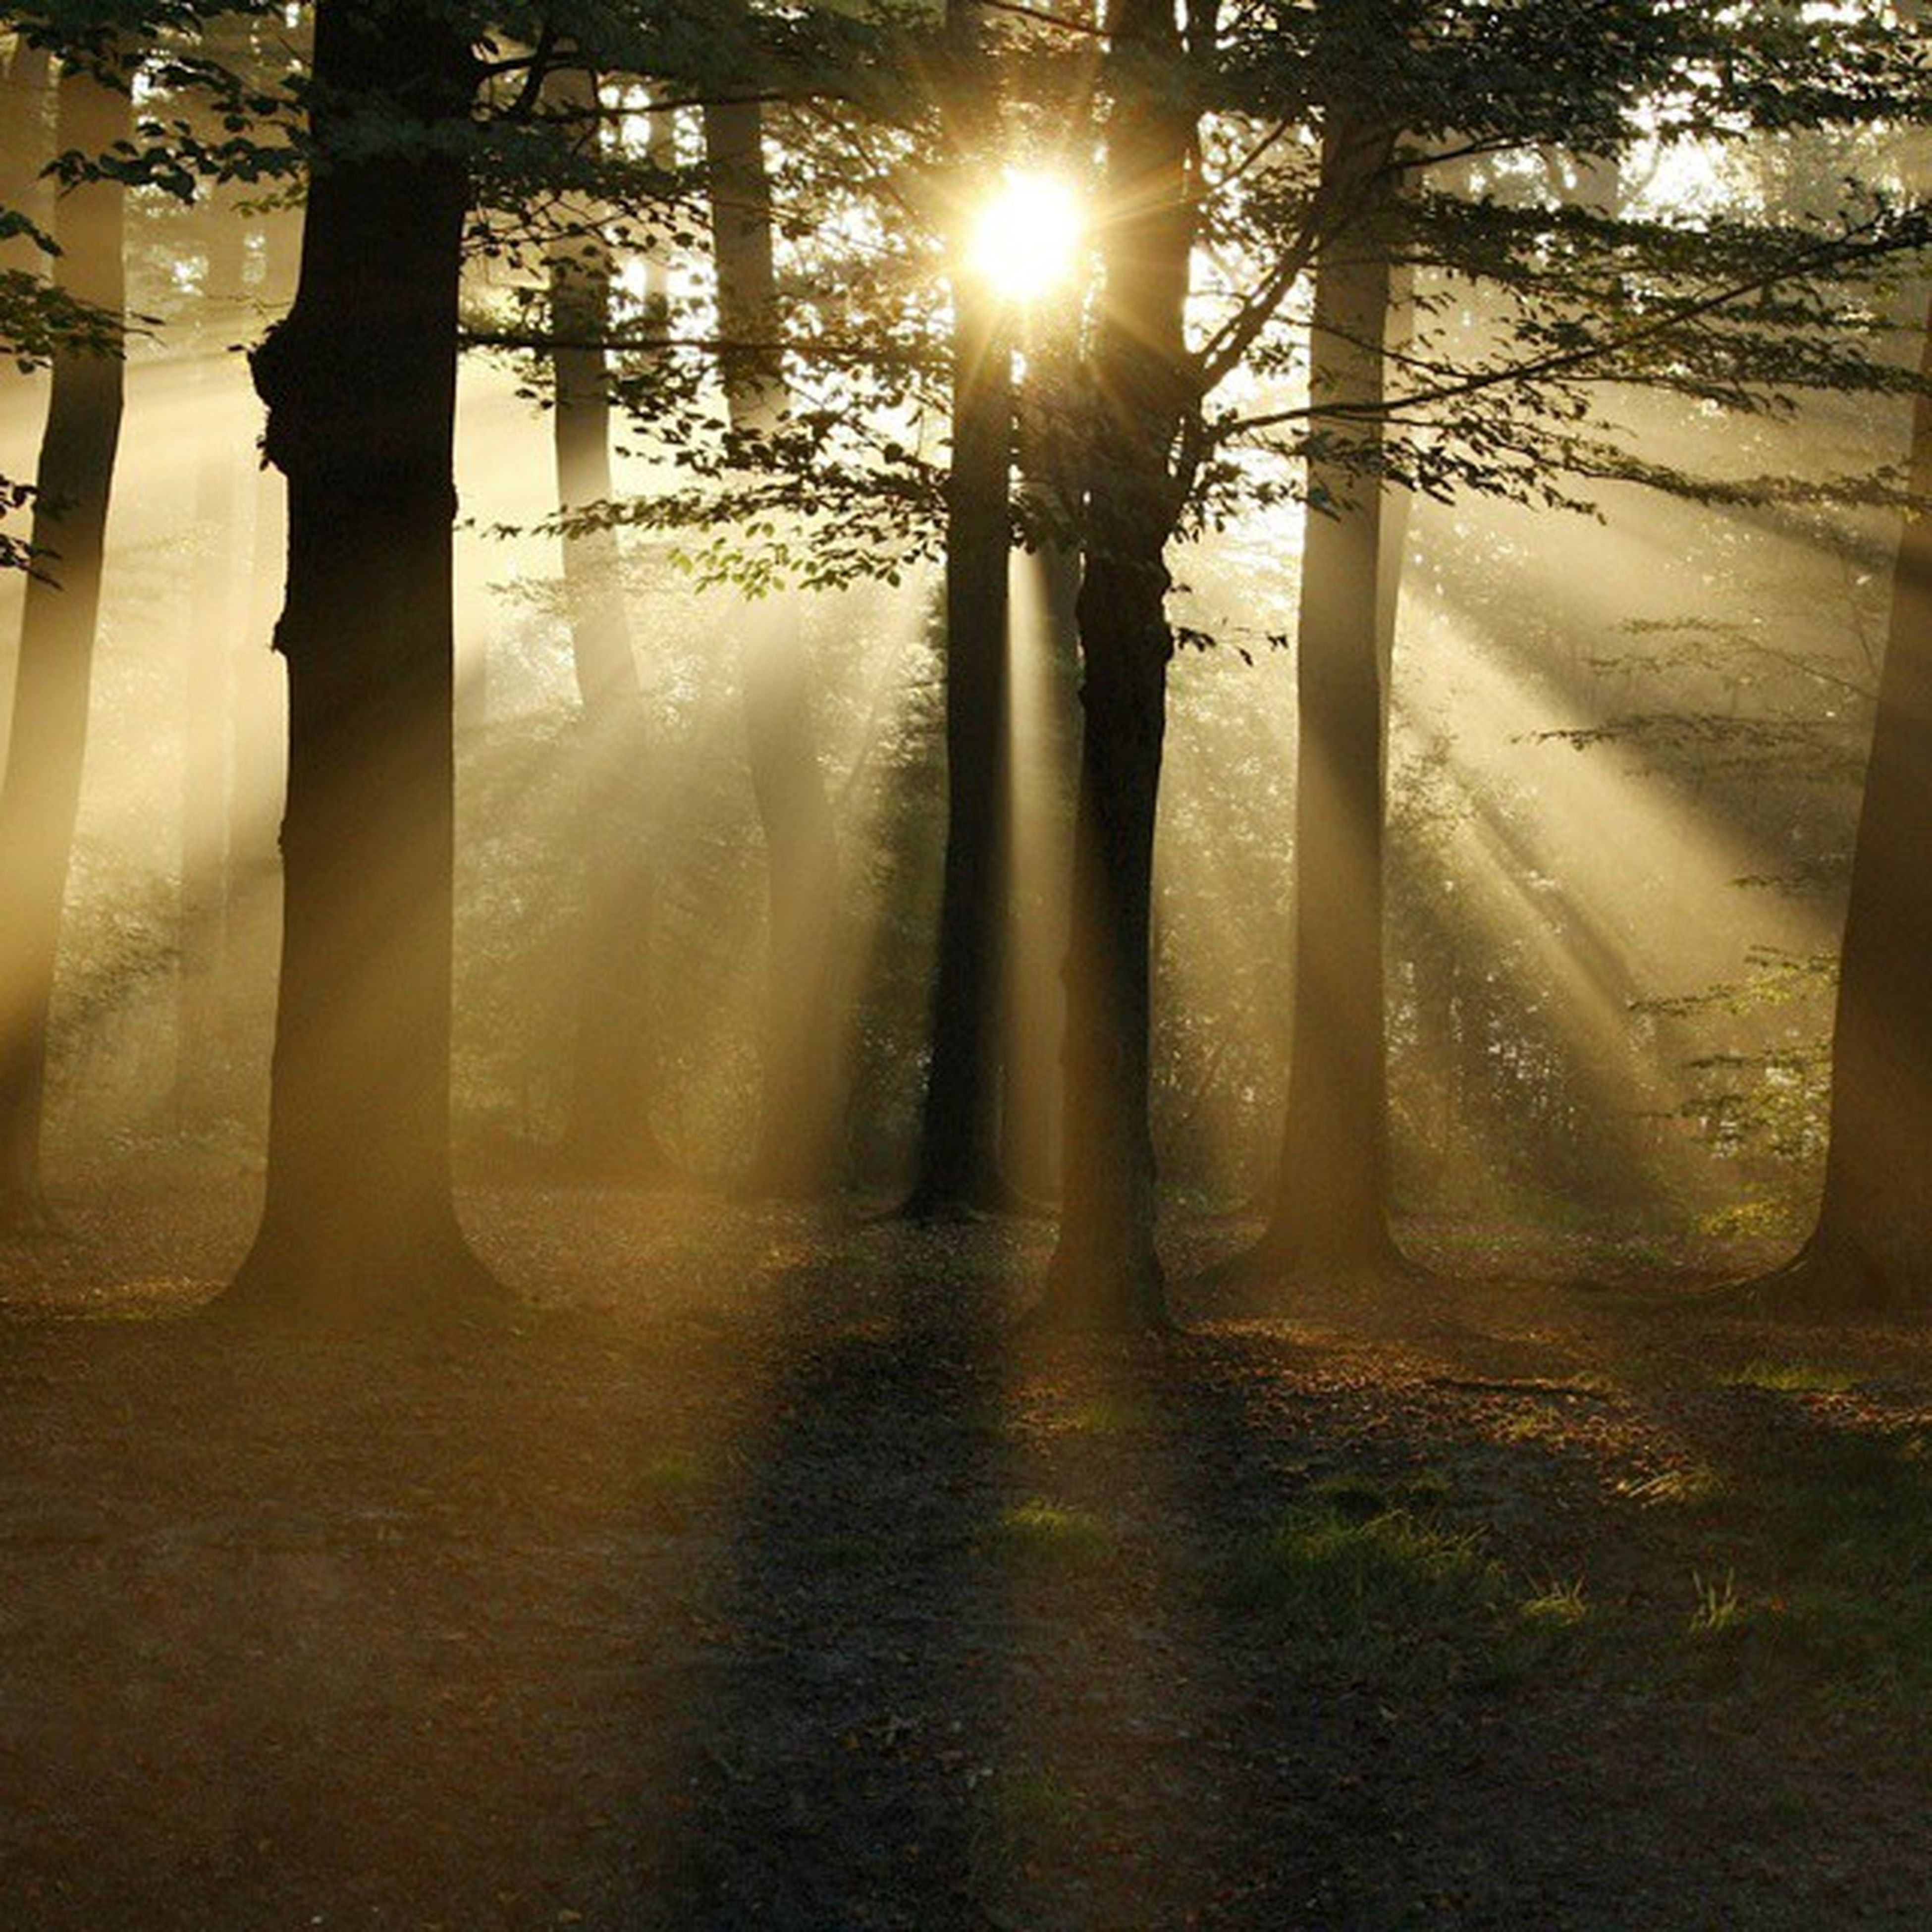 My click Sony_xperia That's Kodaikanal for you 😉 Paradise on earth 🌏 No edits Woods Summer Sun Coakers_walk Nature @narmadavs @radhika_vaidun